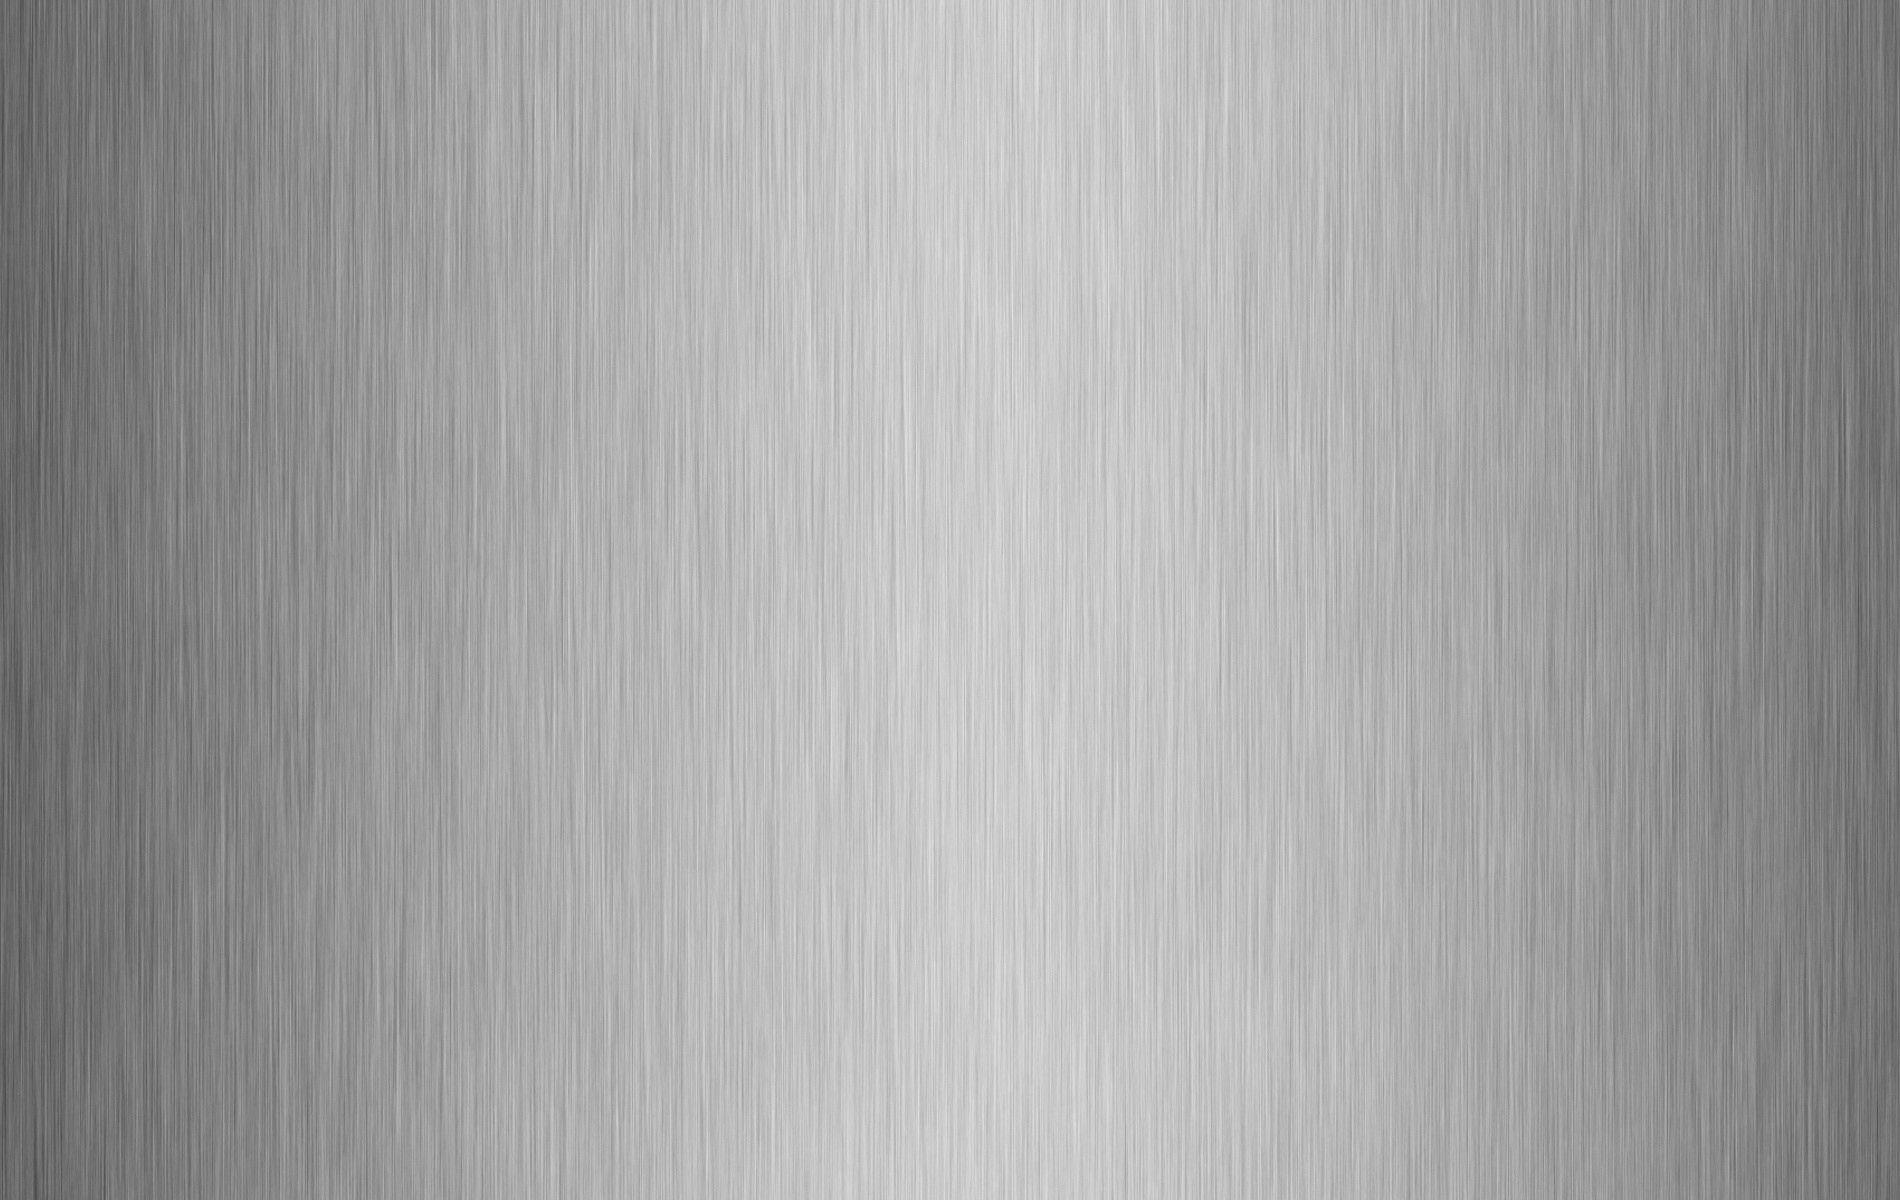 Aluminum Background Download 1900x1200